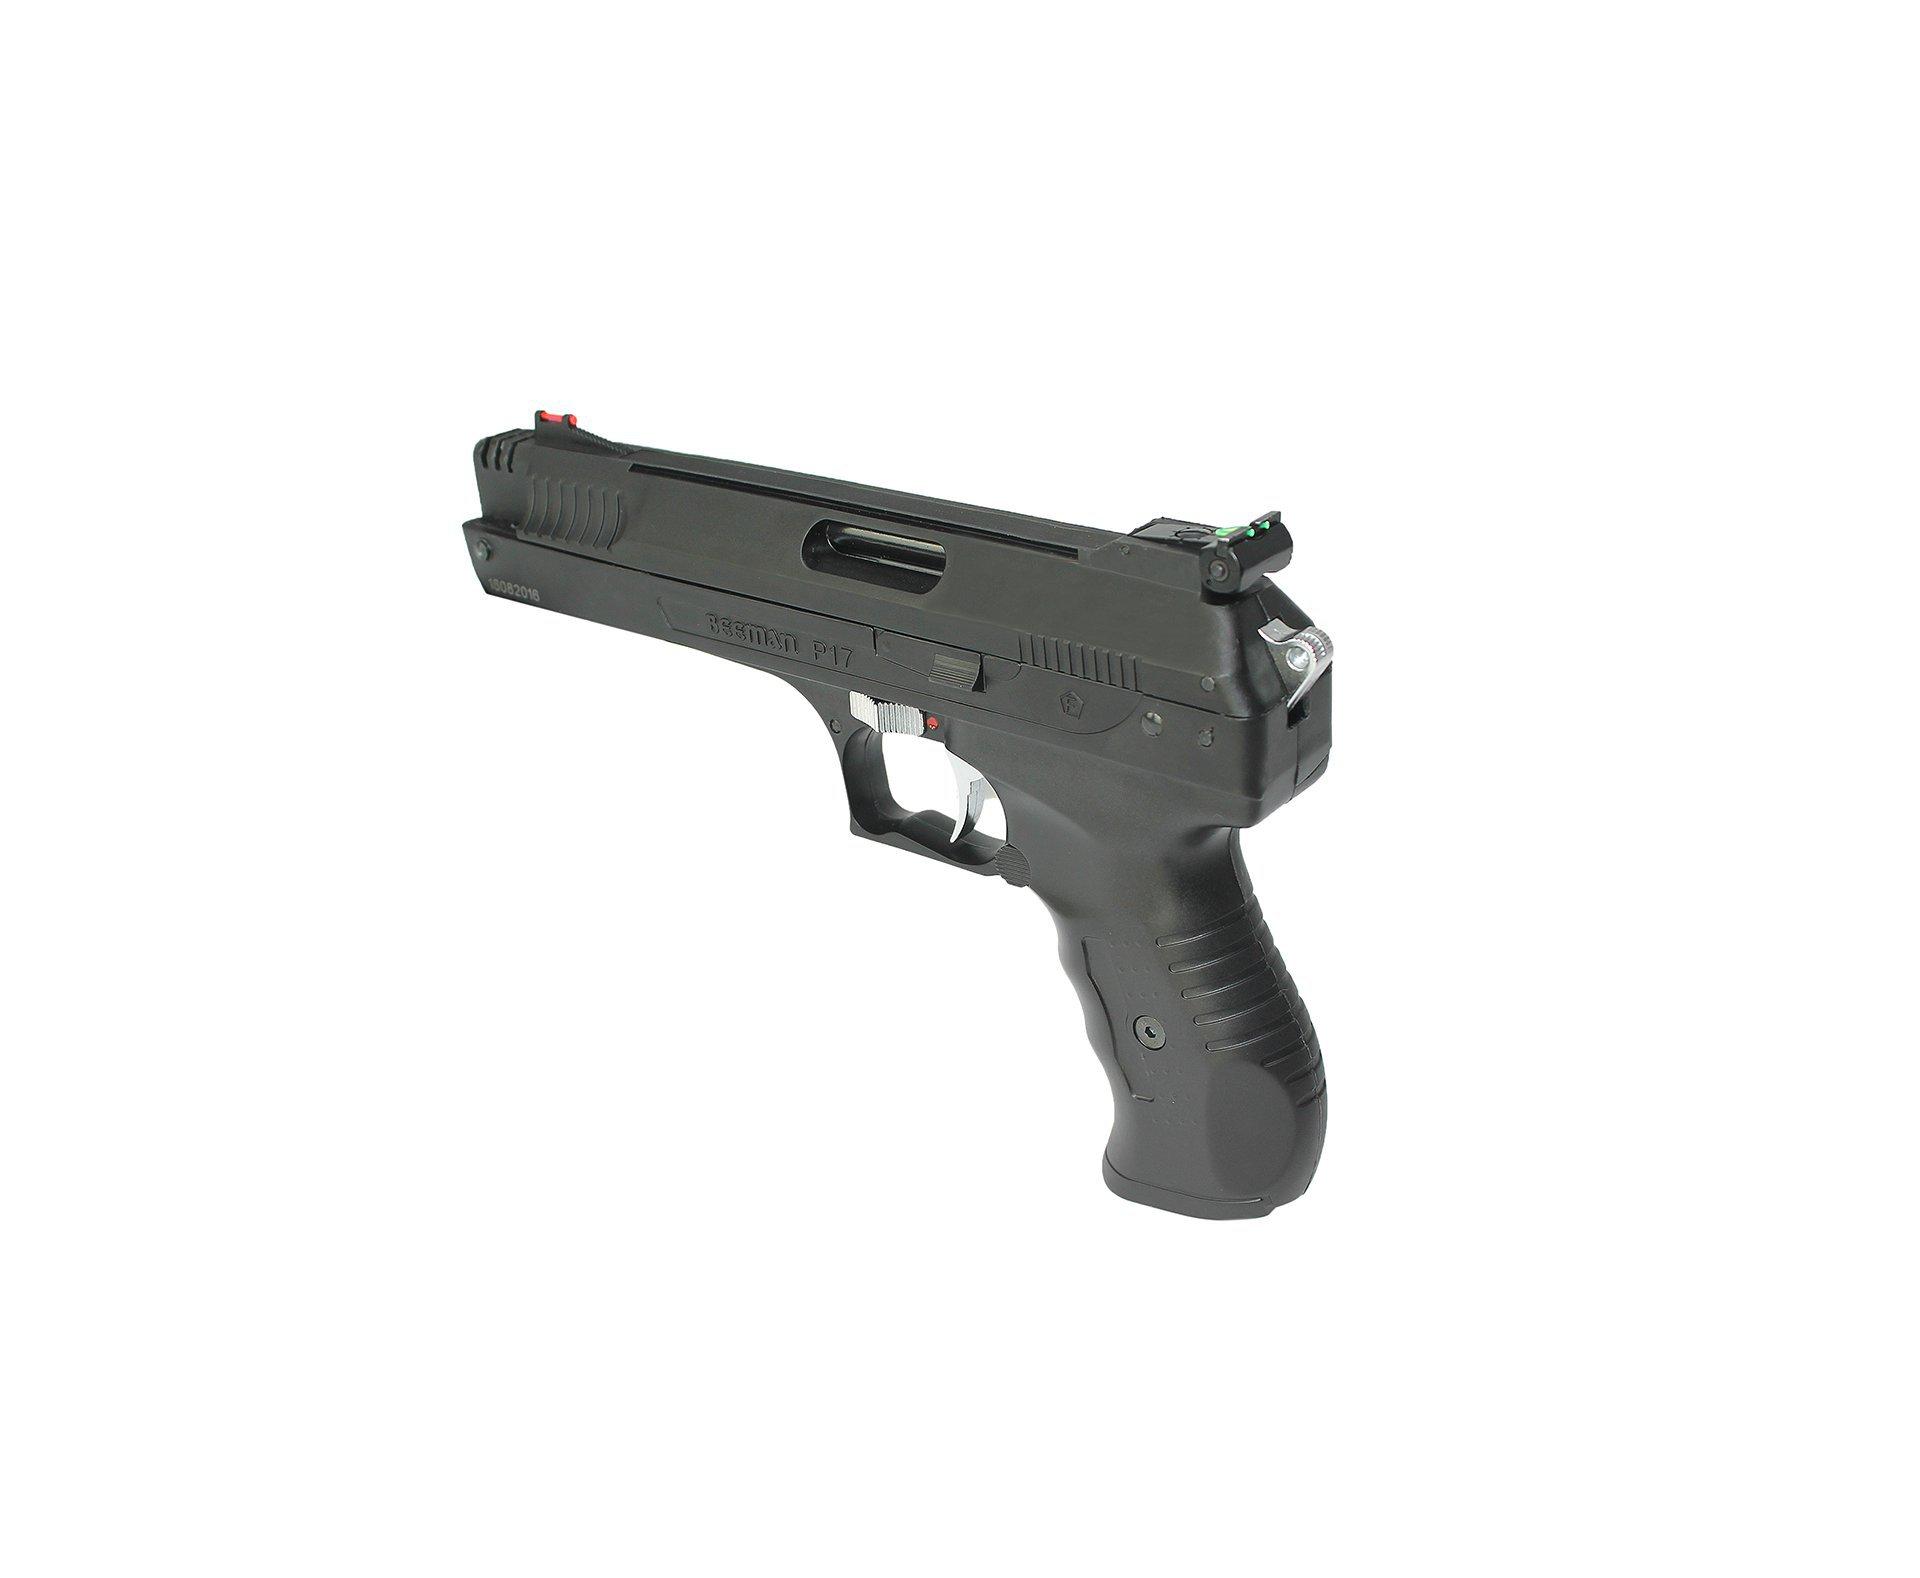 Pistola De Pressão Beeman 2004 P-17 Cal 5,5mm - Rossi